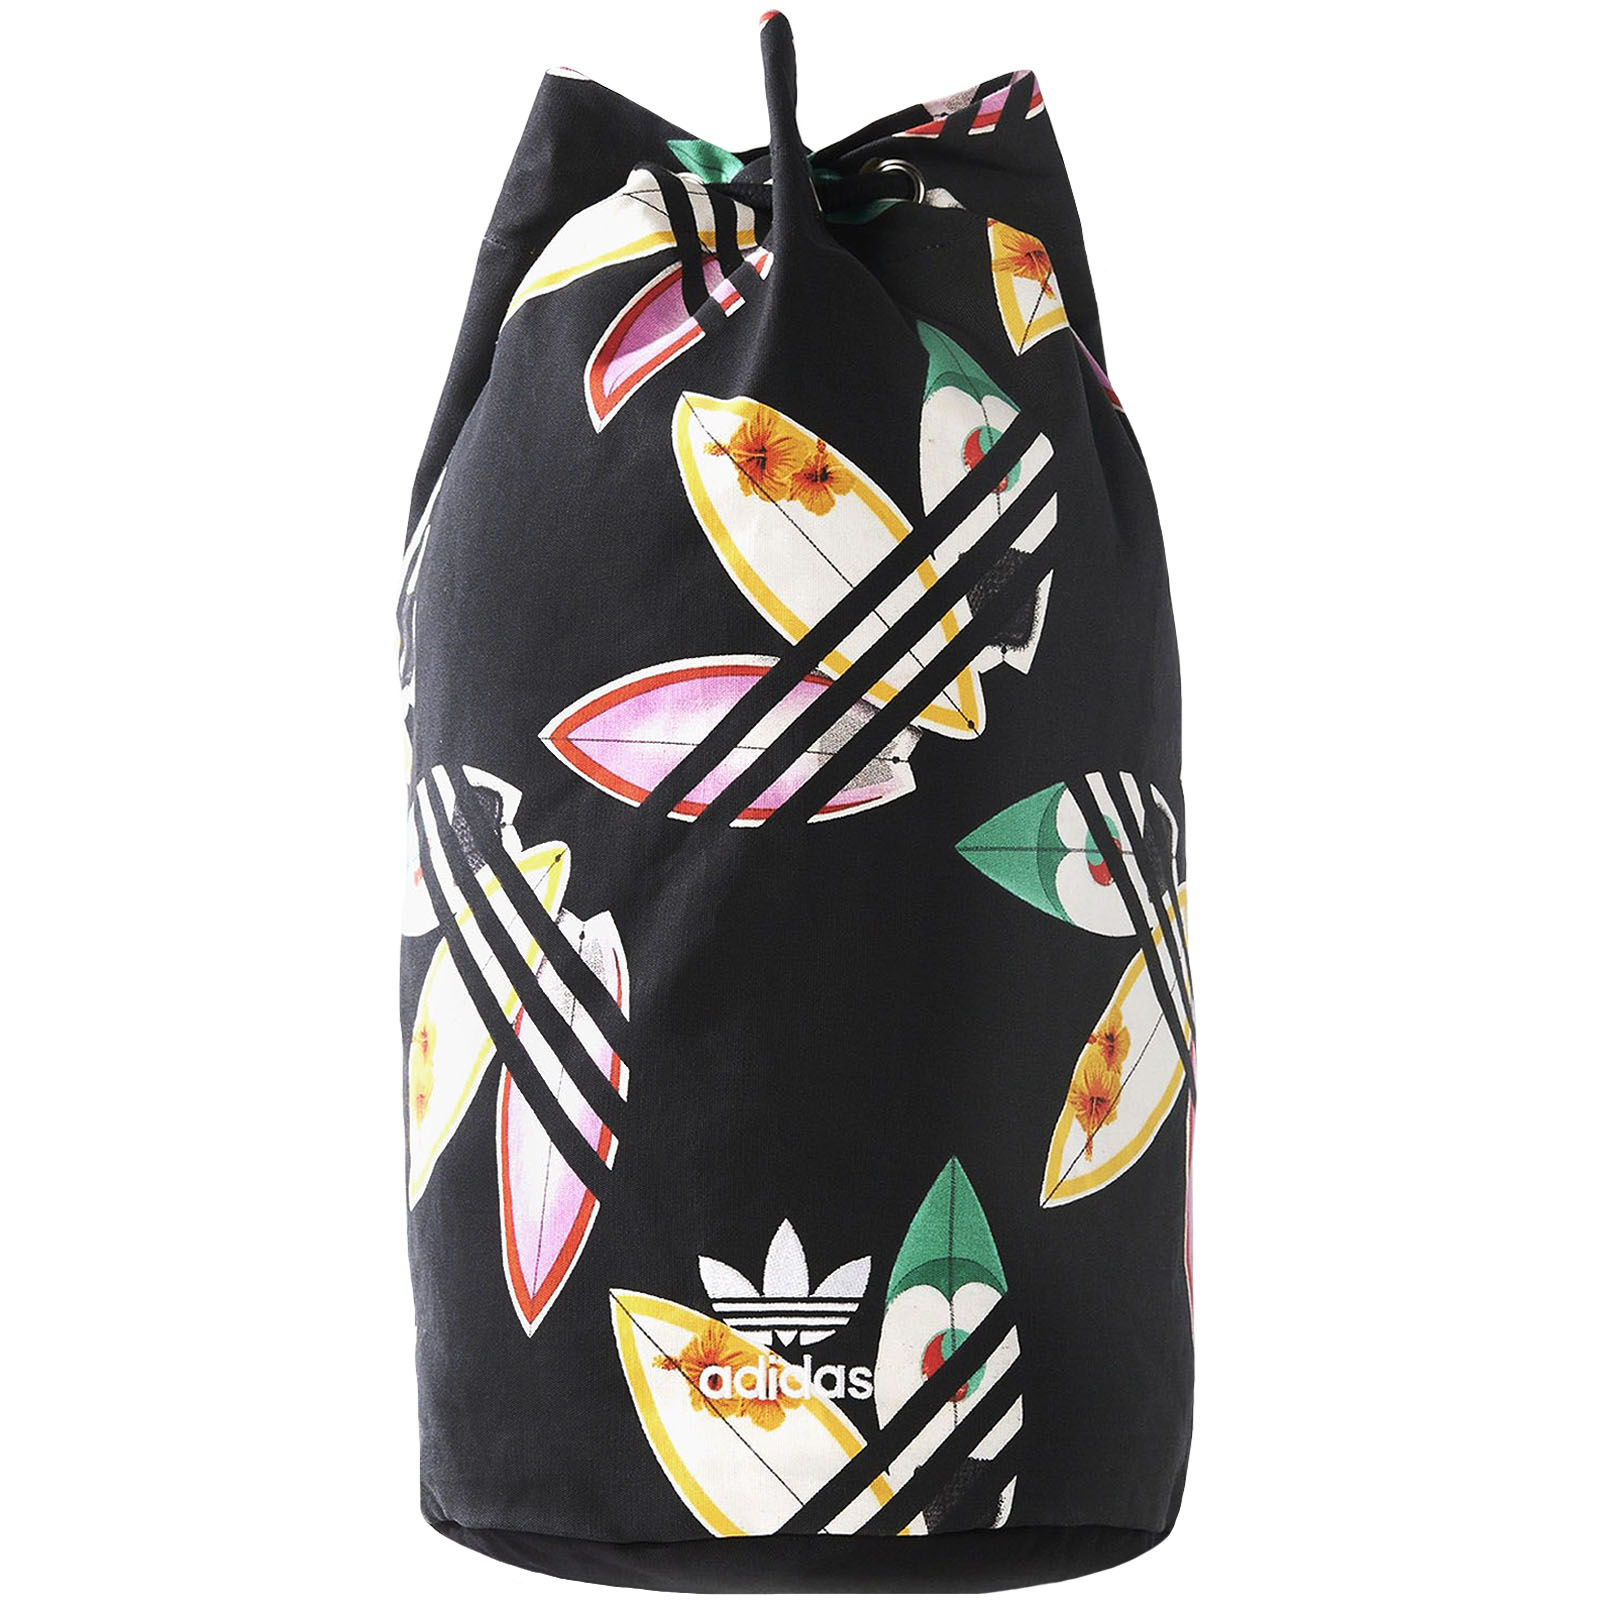 81fc00f79273 Details about adidas Originals Unisex Pharrell Williams Sports Surf Seasack  Backpack - Black